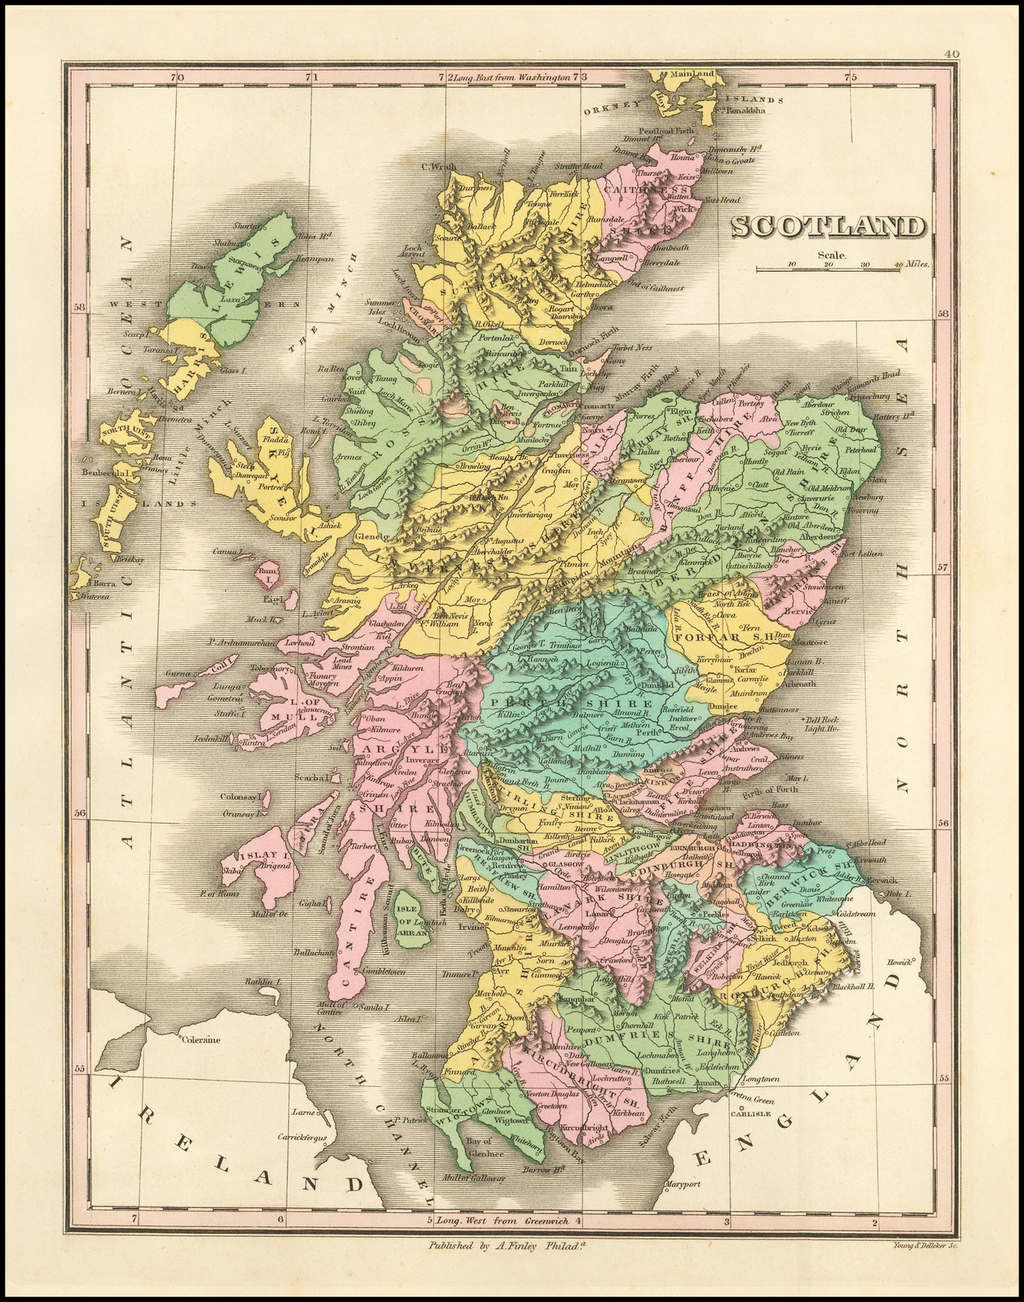 Scotland By Anthony Finley